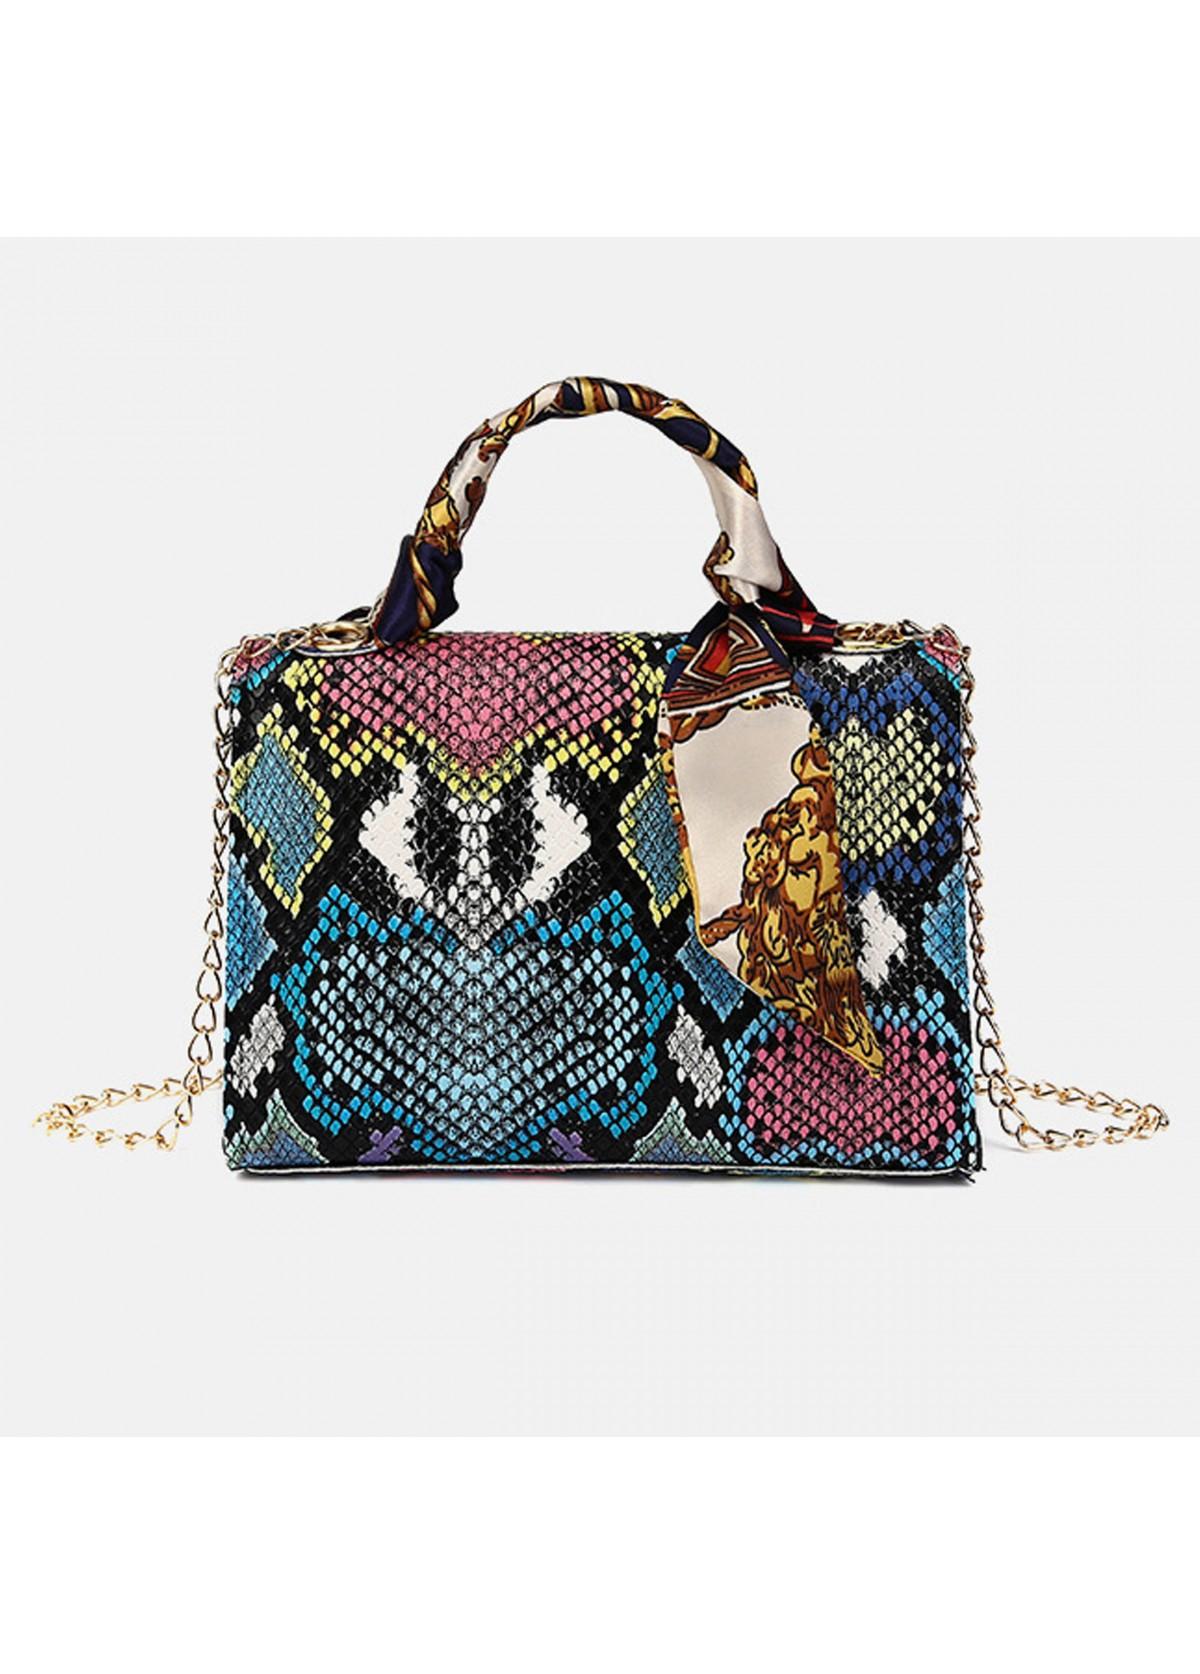 Gold Chain PU Snake Print CrossBody Messenger Bag